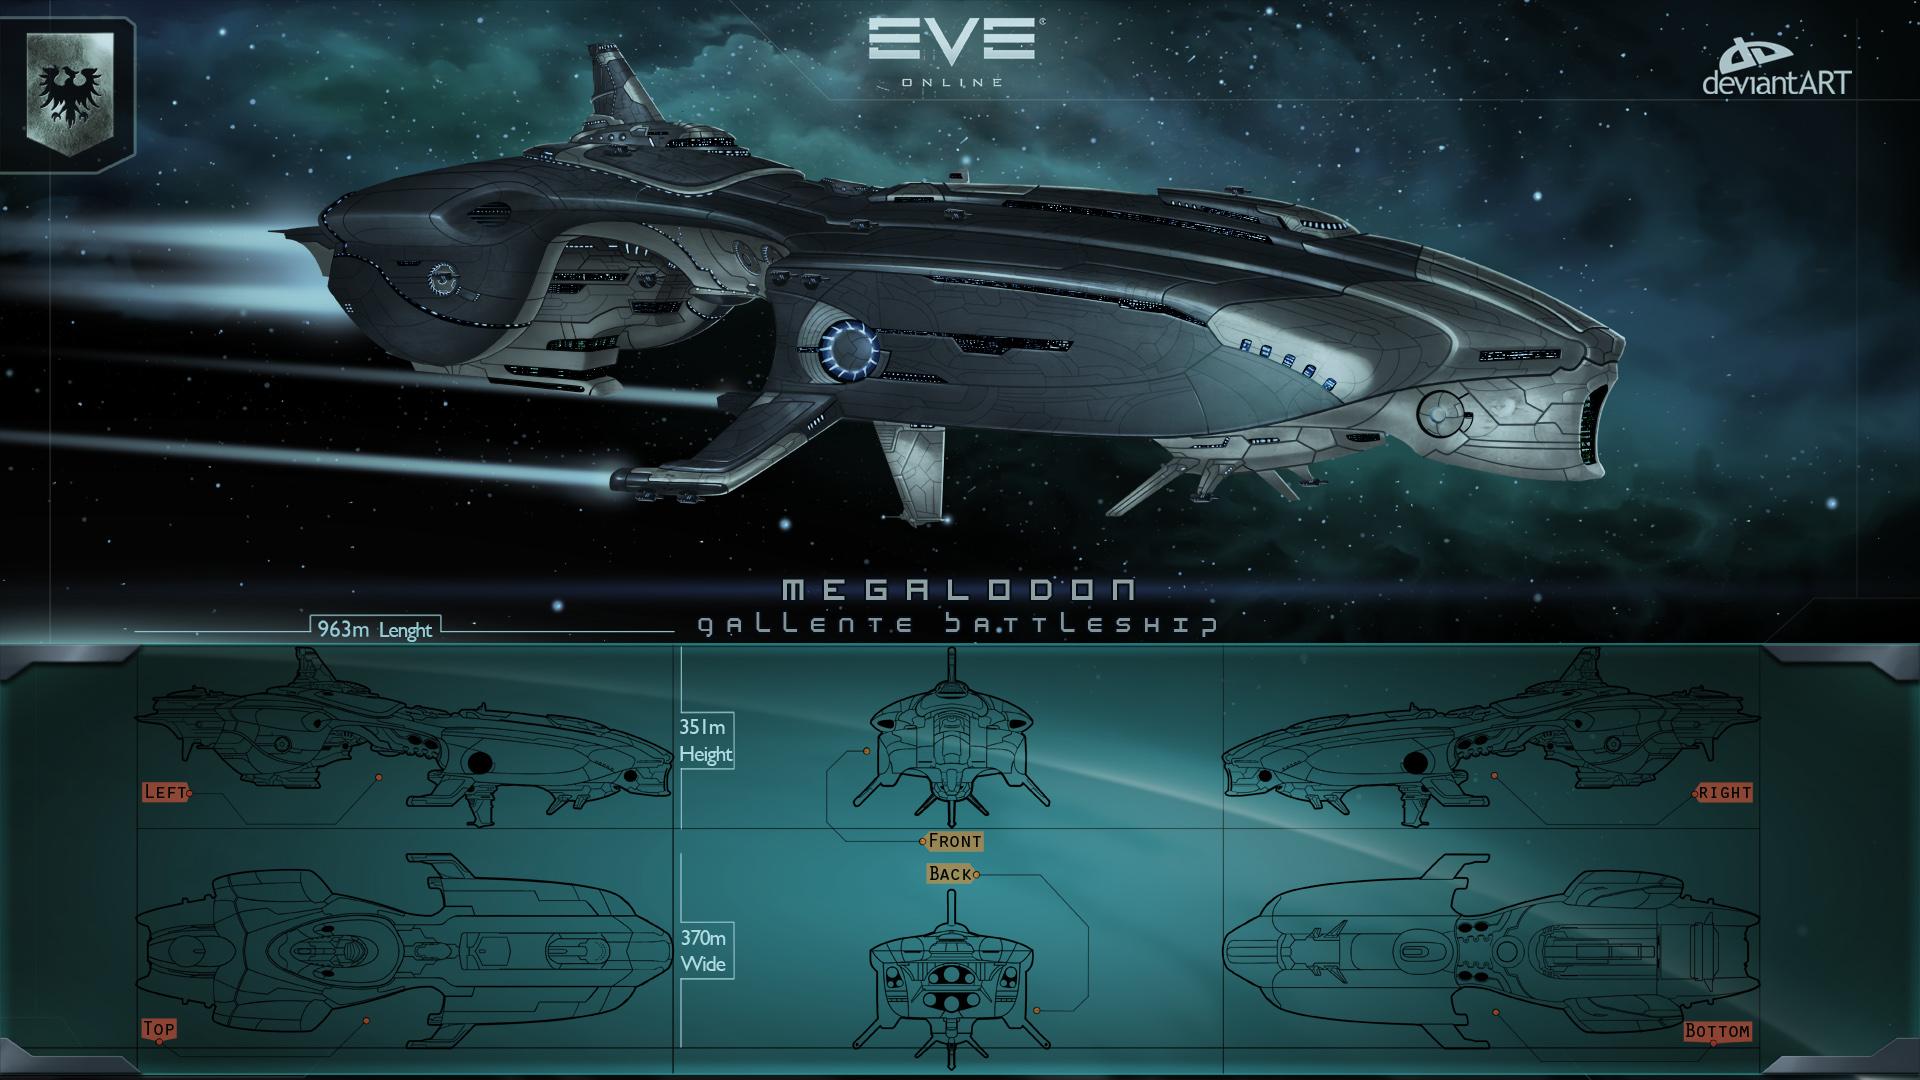 Megalodon-Battleship by Akiman